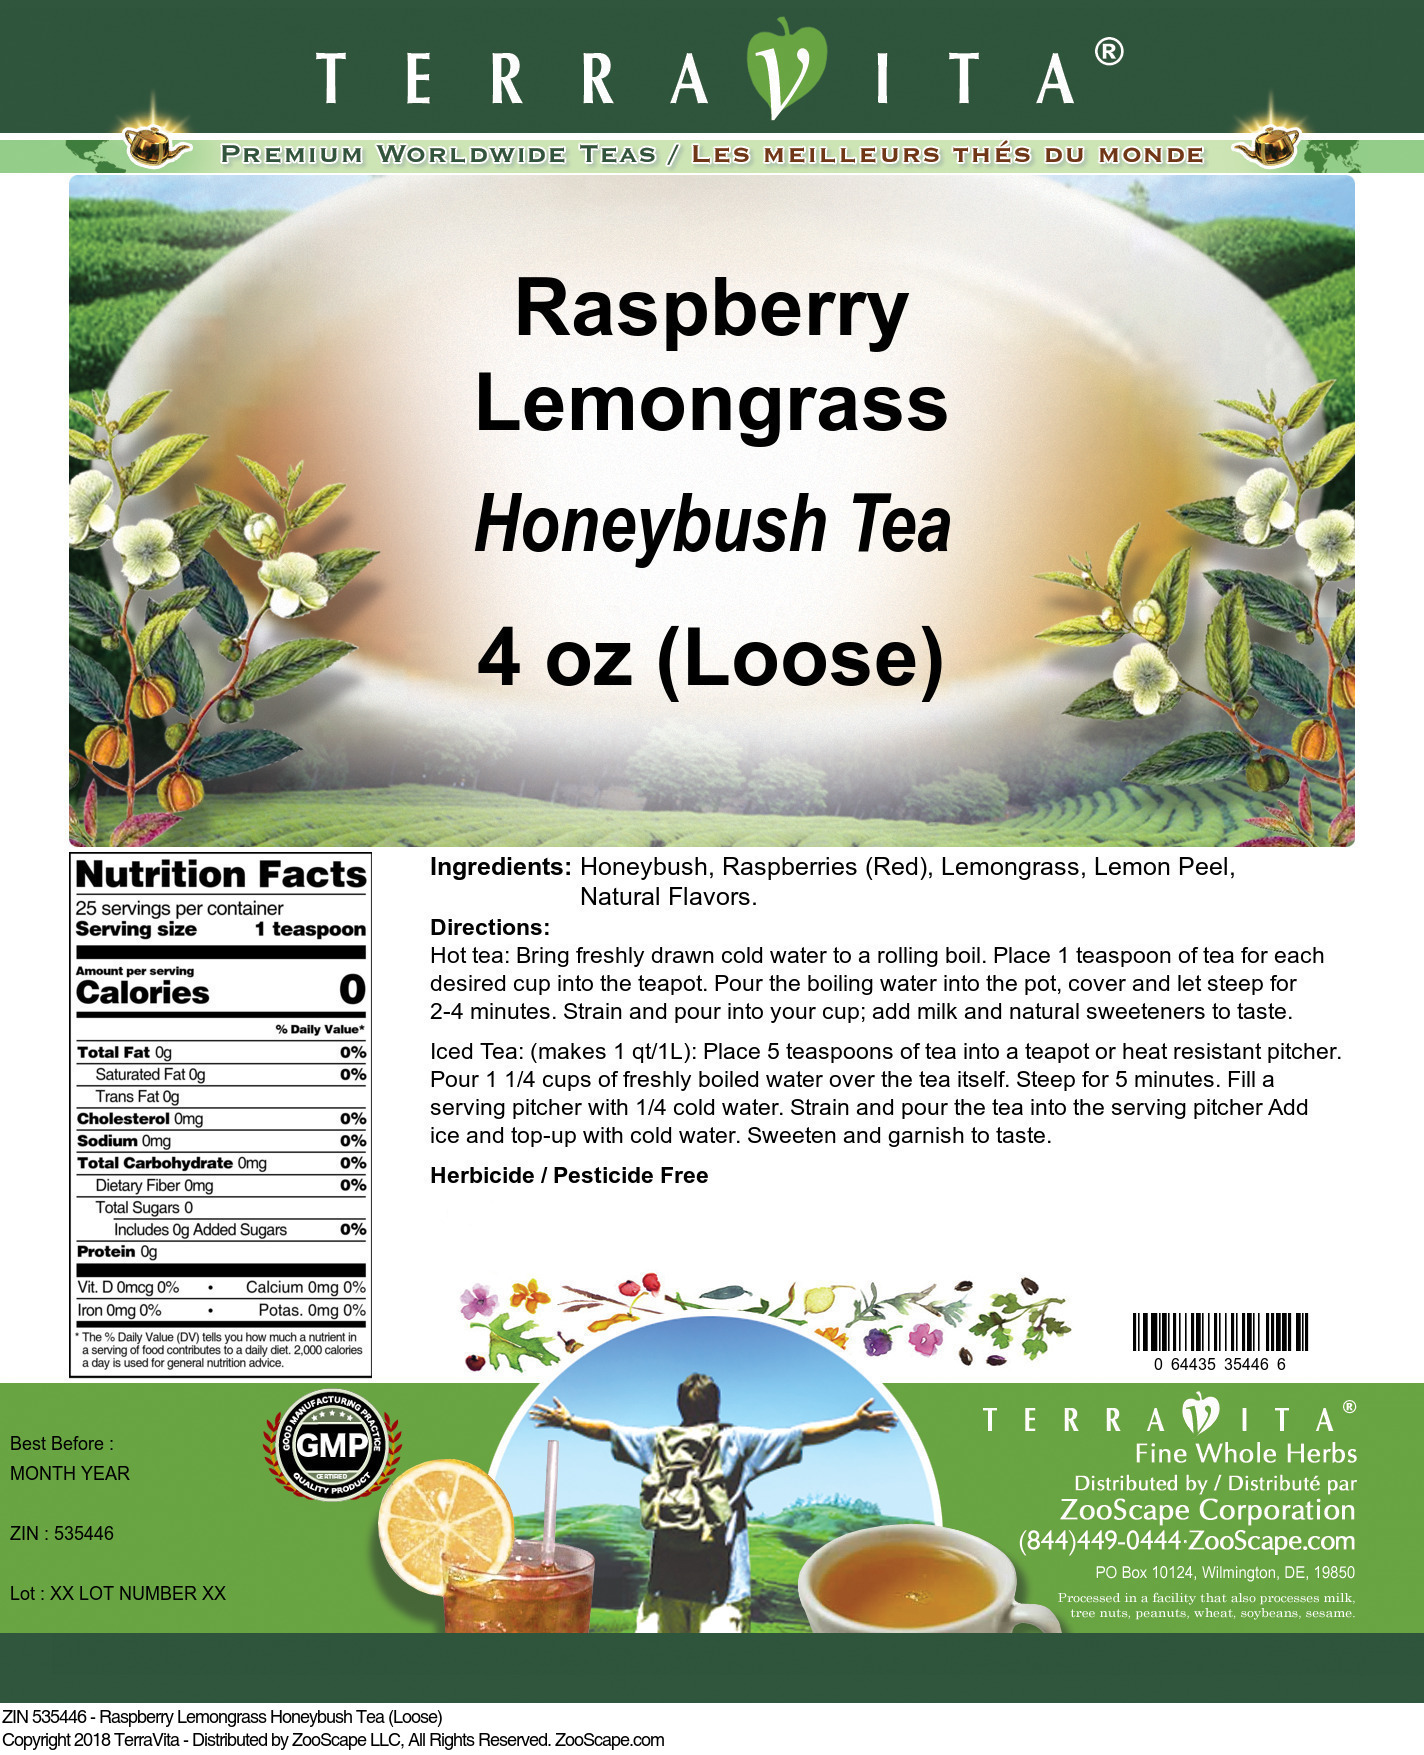 Raspberry Lemongrass Honeybush Tea (Loose)